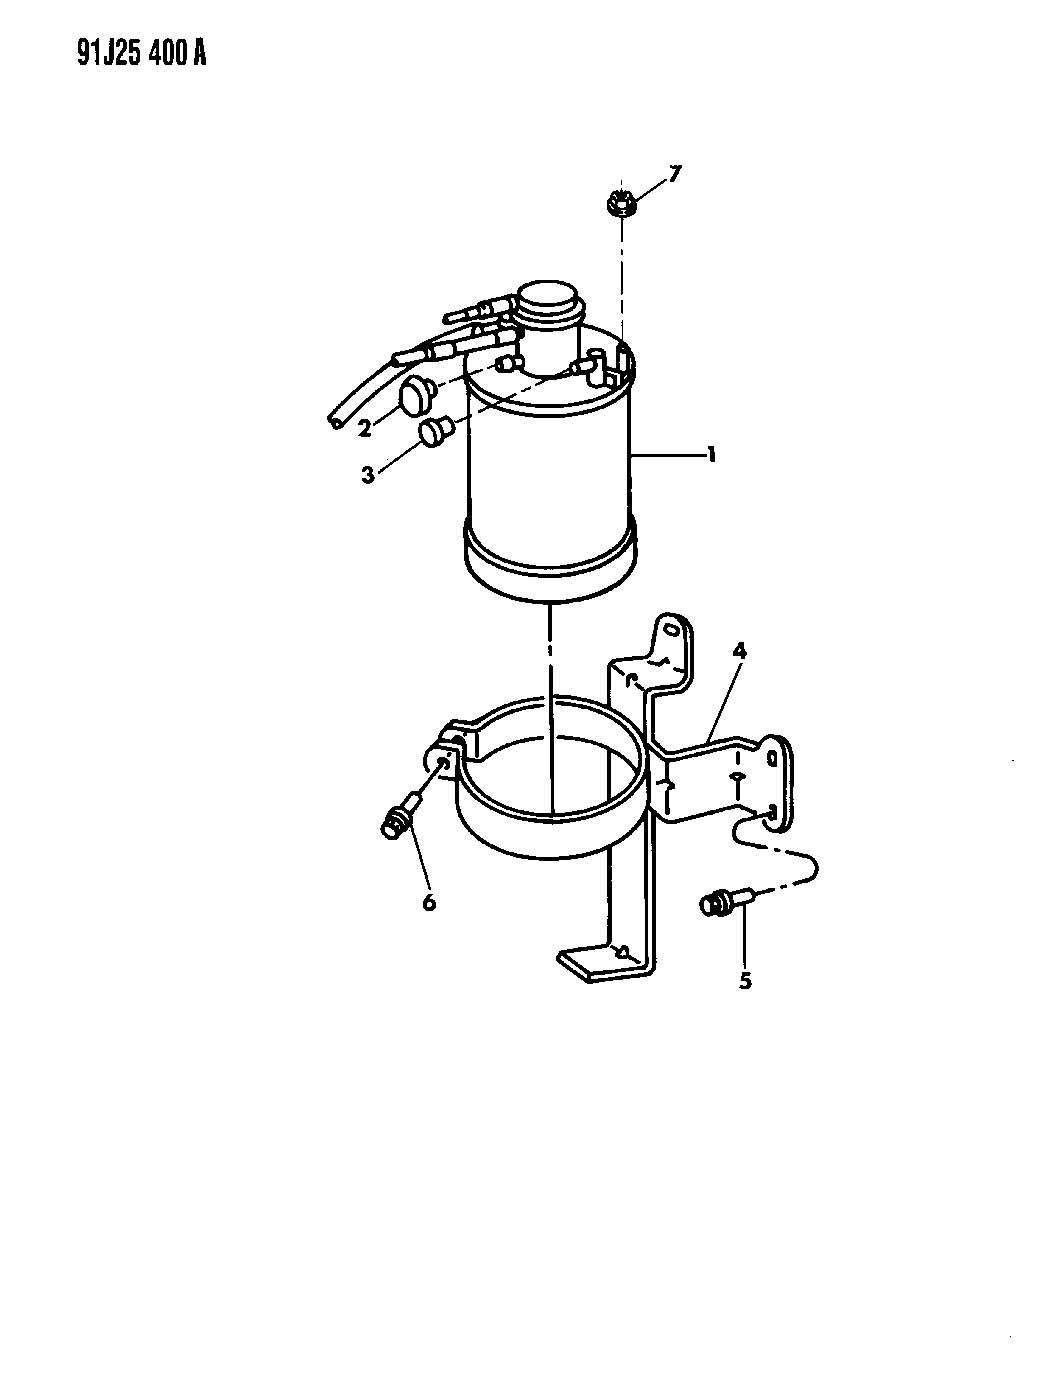 1992 jeep cherokee vapor canister wrangler  cherokee